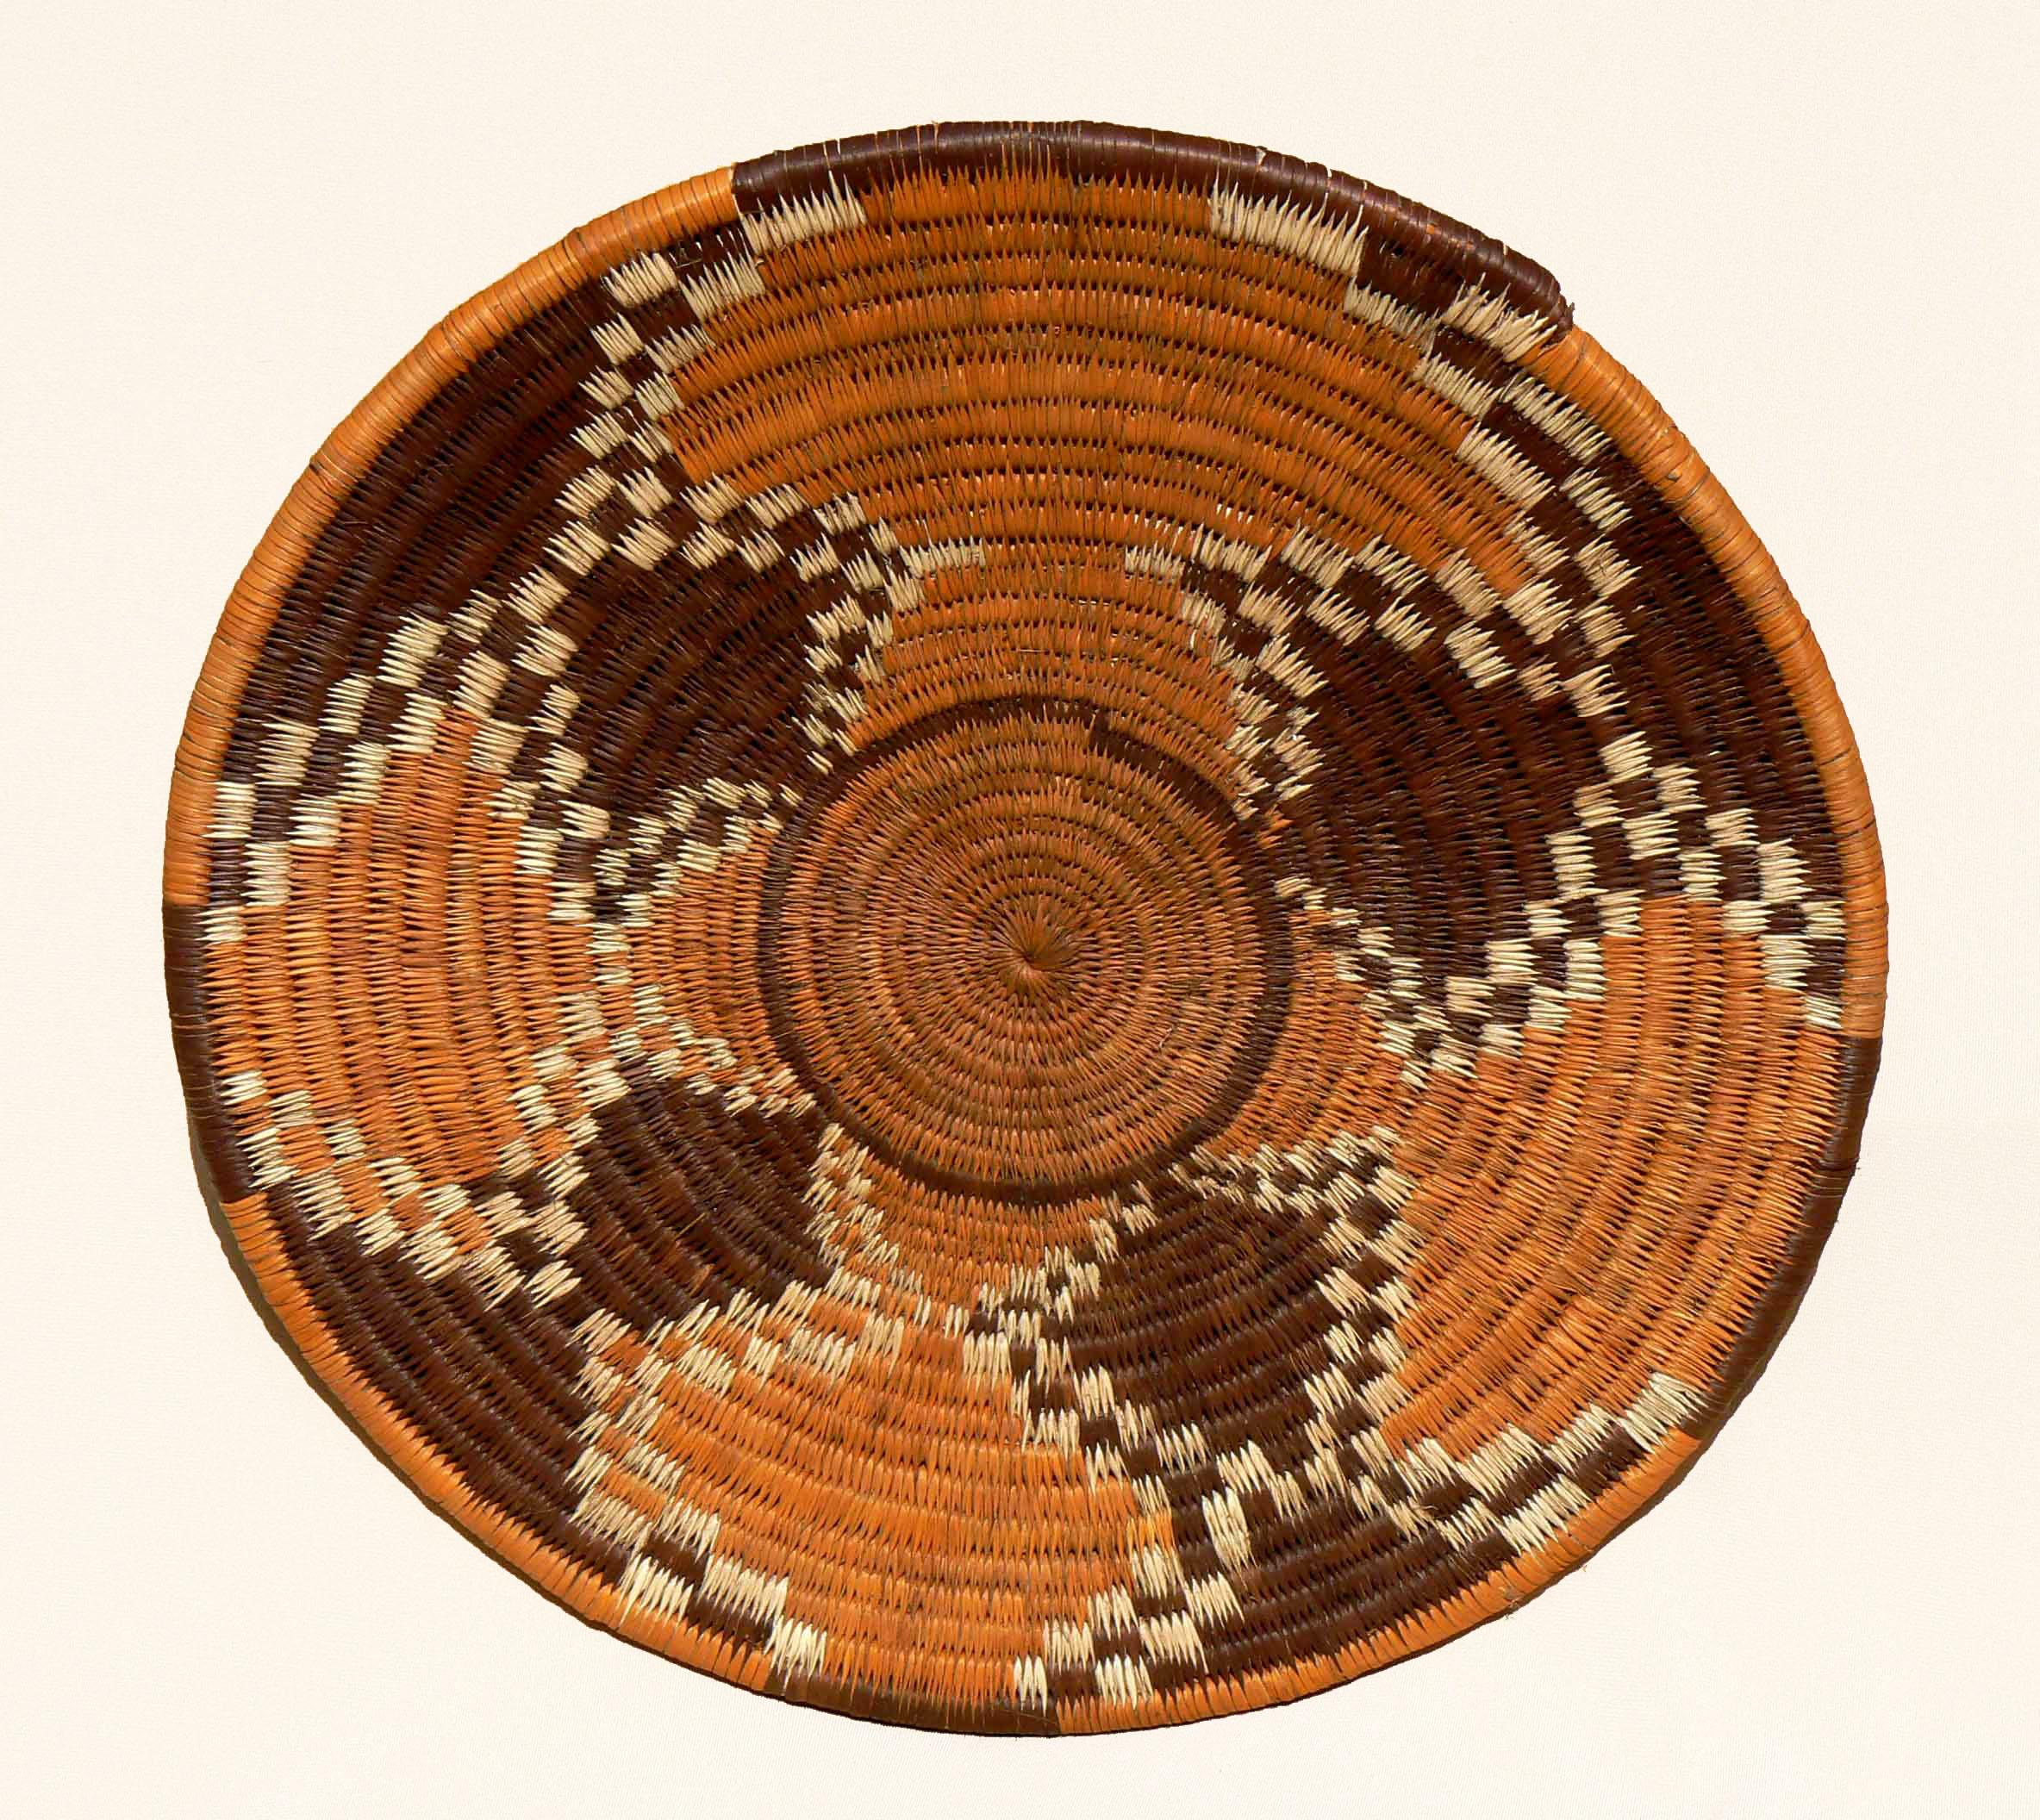 Basket Weaving Botswana : Ndalama african deserts crafts a look at botswana